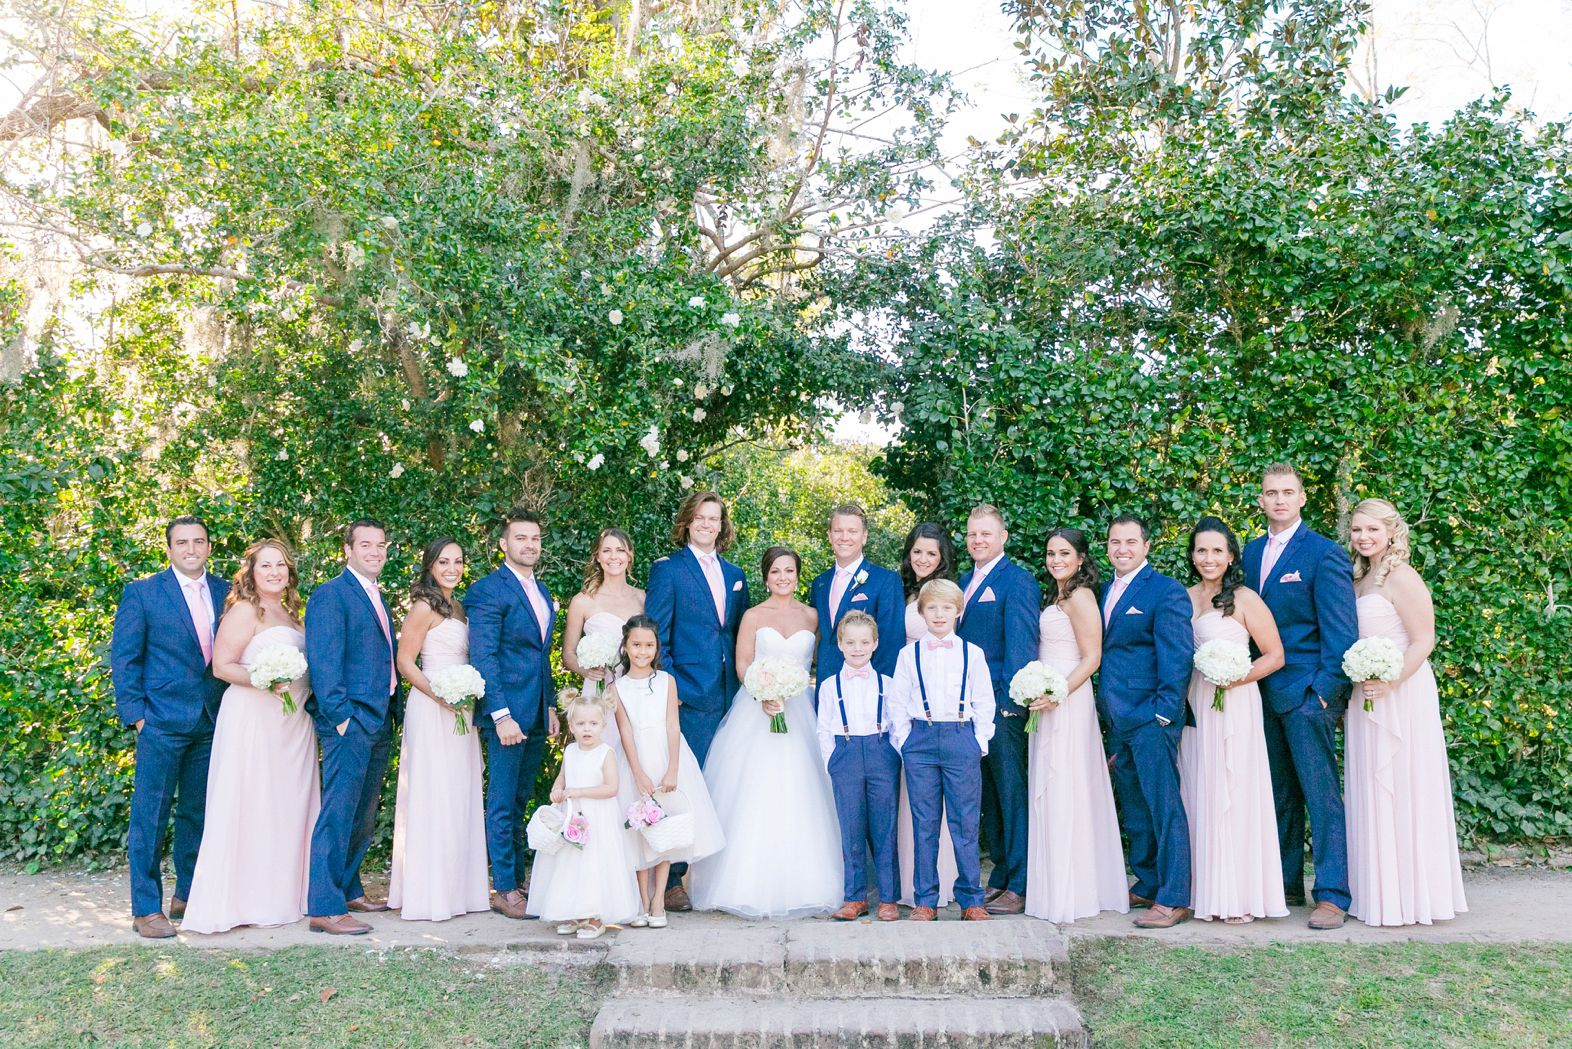 Long Blush Bridesmaid Dresses And Navy Blue Suits Blush Ivory Navy Gold Fall Wedding At Middleton Navy Gold Wedding Blush Bridesmaid Dresses Long Wedding